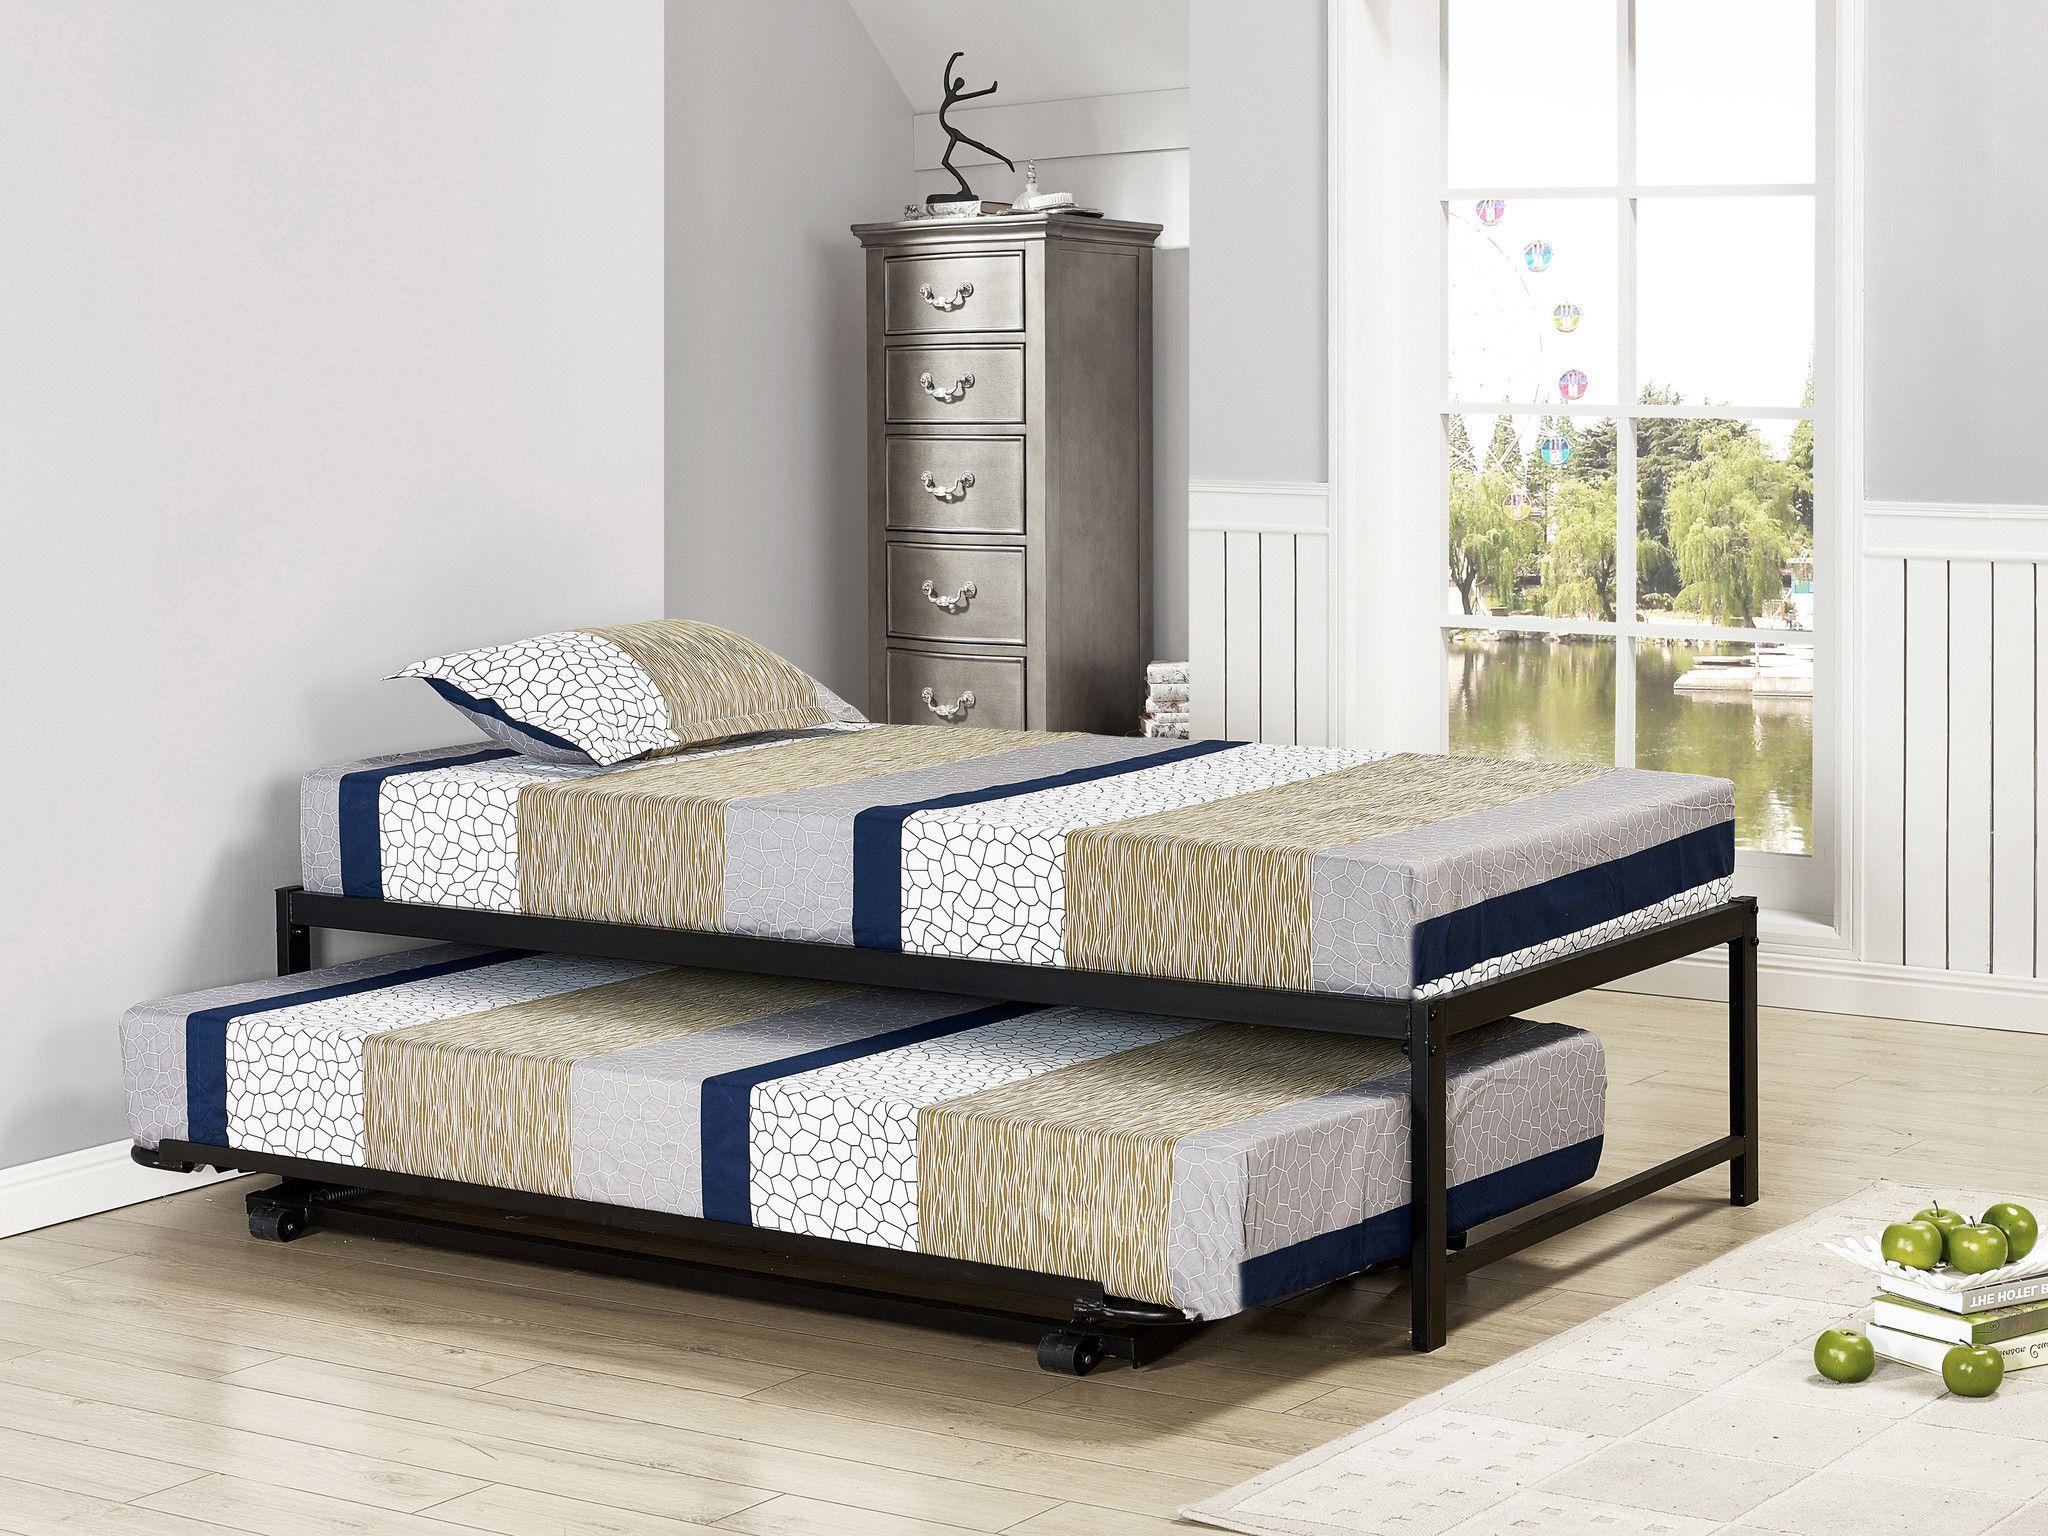 Pilaster Designs 39 Twin Size Black Metal High Riser Bed Frame With Pop Up Trundle Bed Frame Pop Up Trundle Day Bed Frame